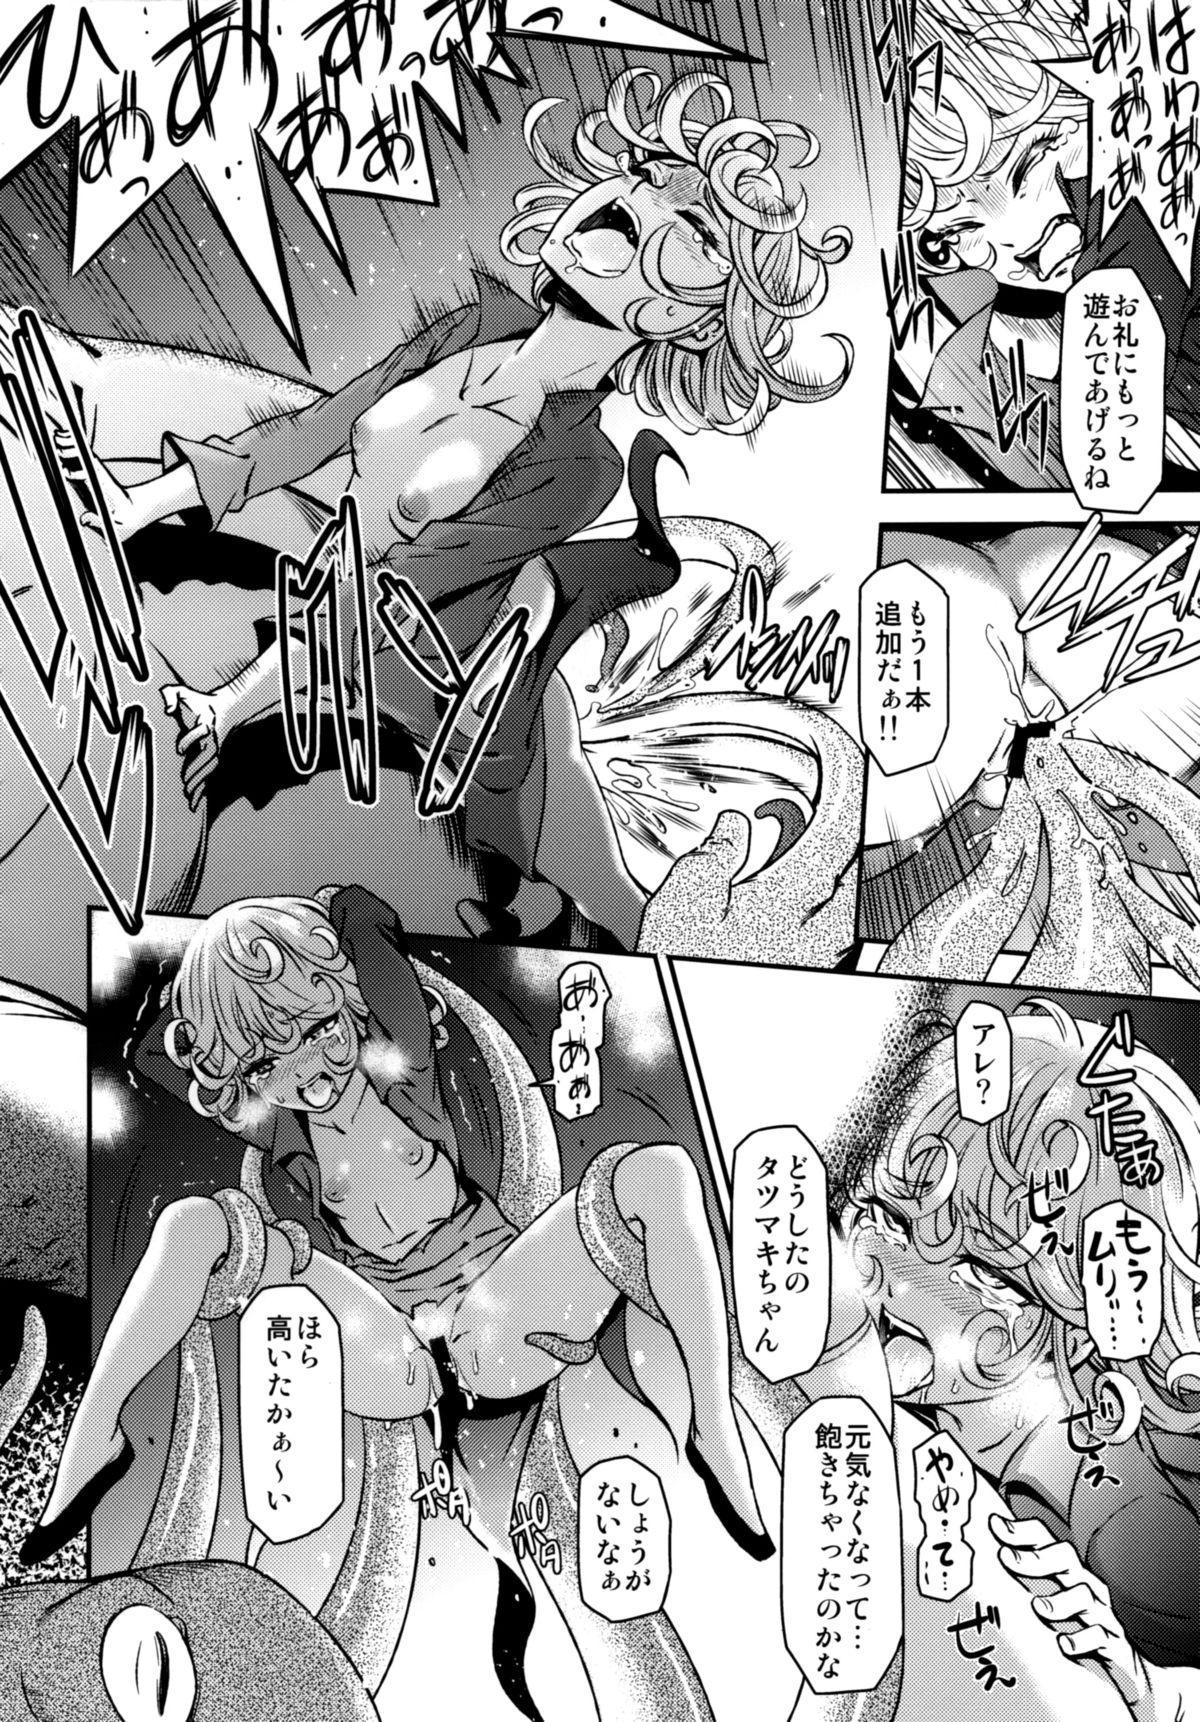 (C89) [Kiyosumi Hurricane (Kiyosumi Hurricane)] ONE-HURRICANE - Kutsujoku no Tatsumaki (One Punch Man) 16